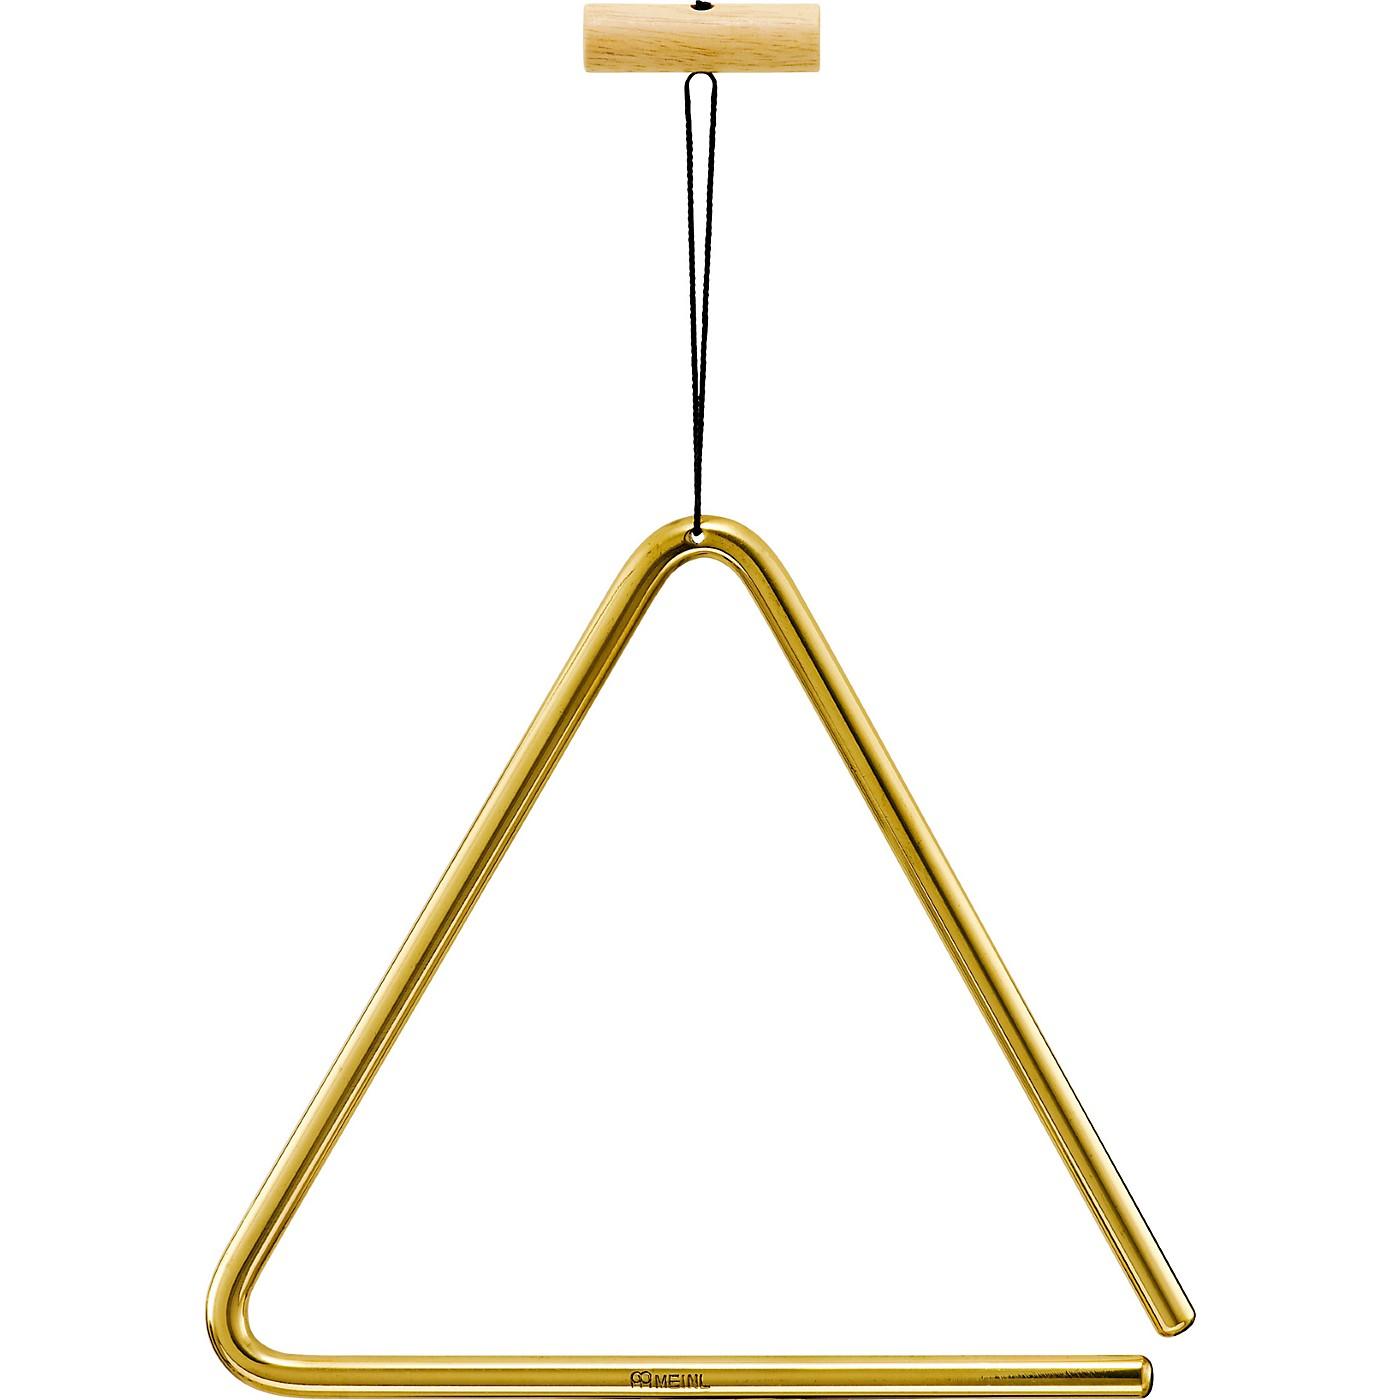 Meinl Brass Triangle thumbnail